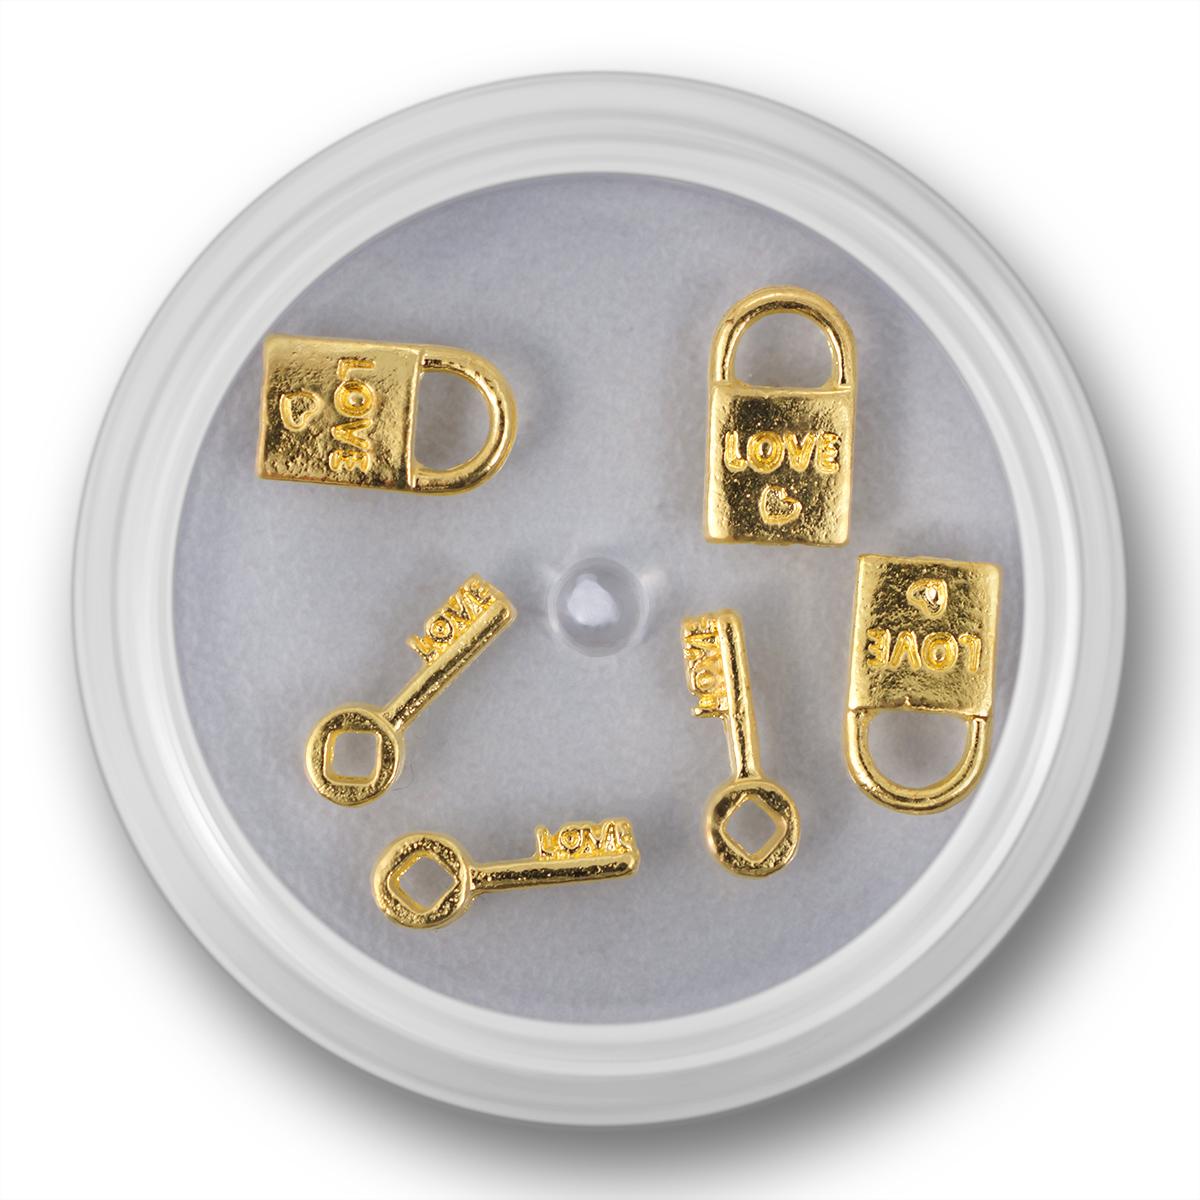 Image of   Negle smykke, lås og nøgle ,guld, 3 stk